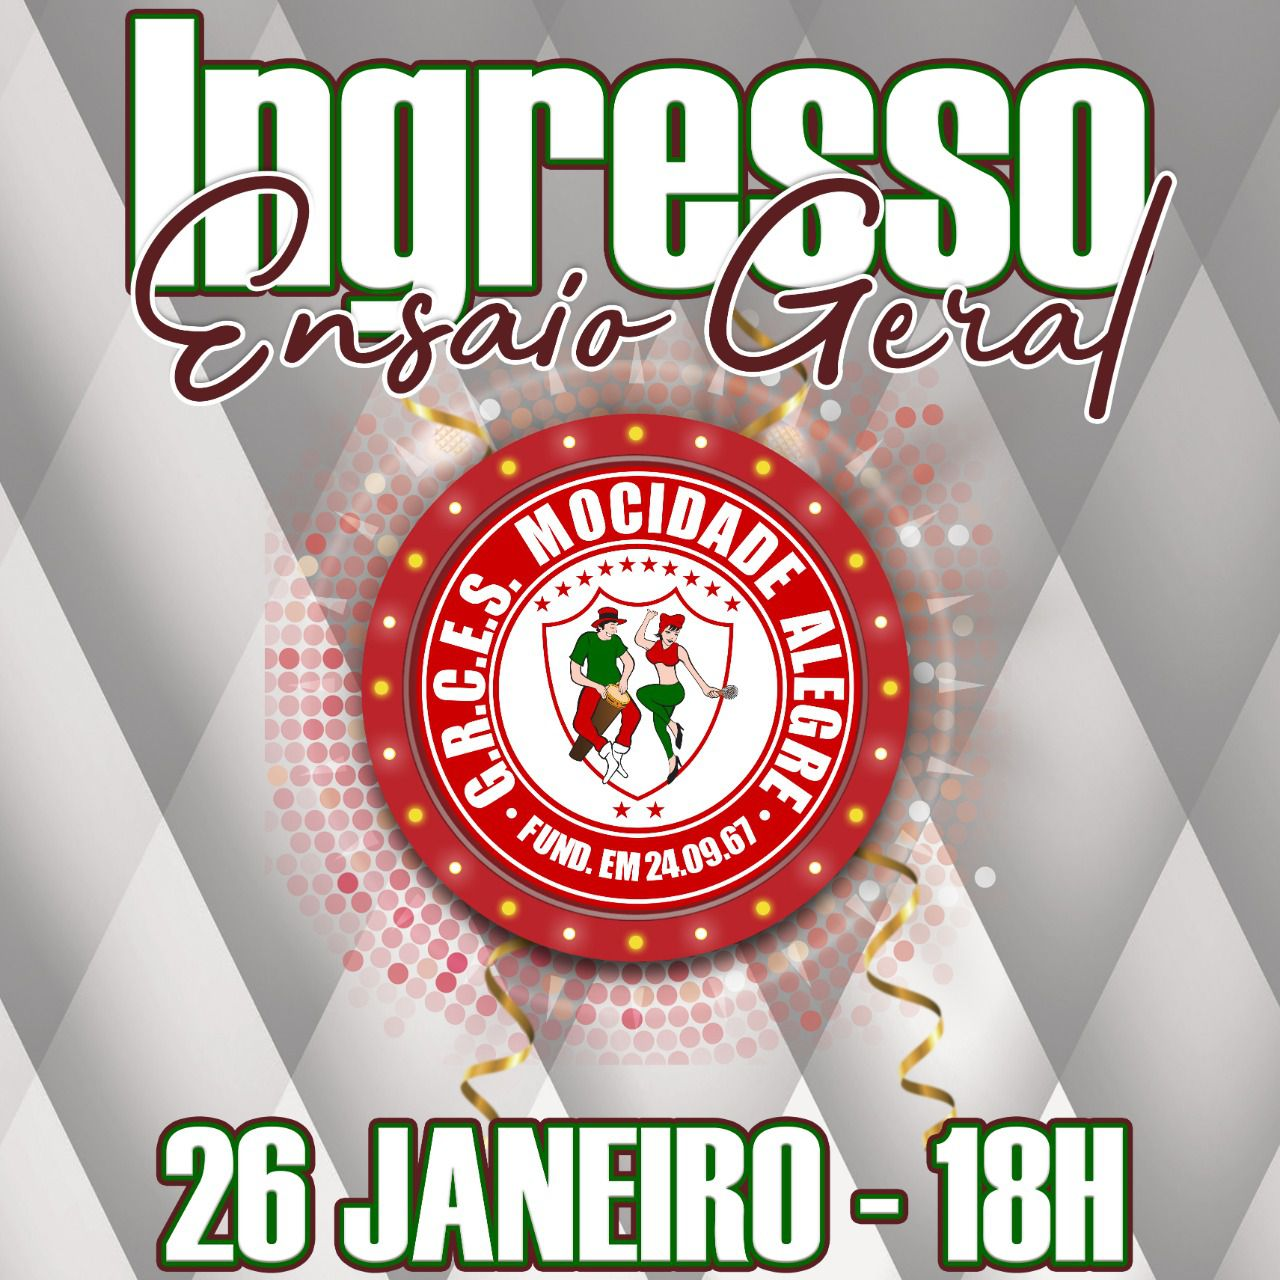 INGRESSO ENSAIO GERAL - 26-01-2020 - CARNAVAL 2020  - Mocidade Alegre